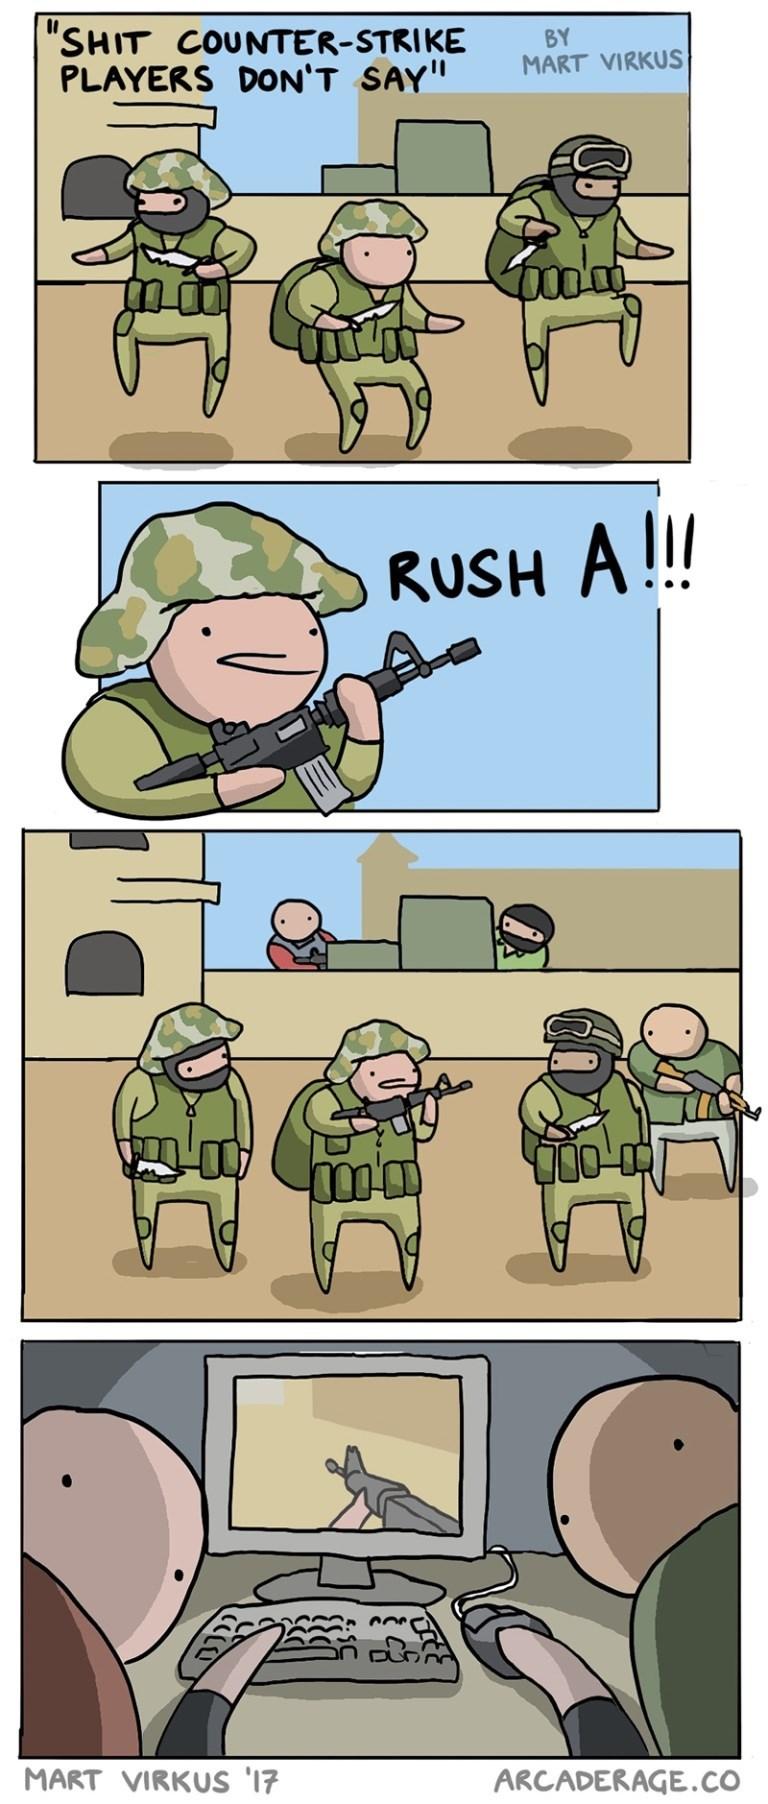 "Cartoon - ""SHIT COUNTER-STRIKE PLAYERS DON'T SAY"" BY MART VIRKUS RUSH A!! MART VIRKUS '17 ARCADERAGE.CO"